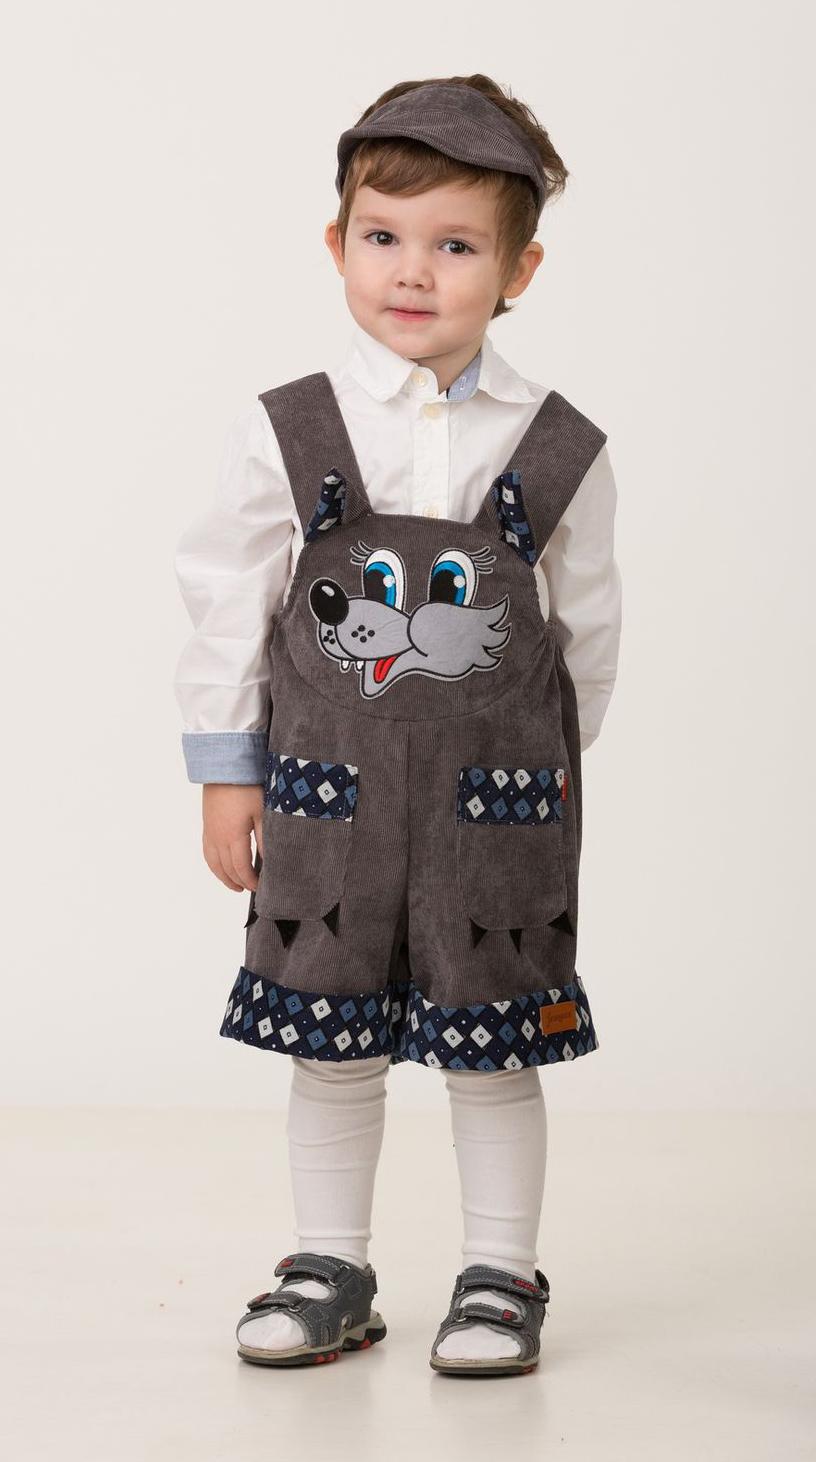 Карнавальный костюм Jeanees Волчонок Крепыш, цвет: тёмно-серый. Размер: 28 карнавальный костюм jeanees мышонок масик цвет серый размер 24